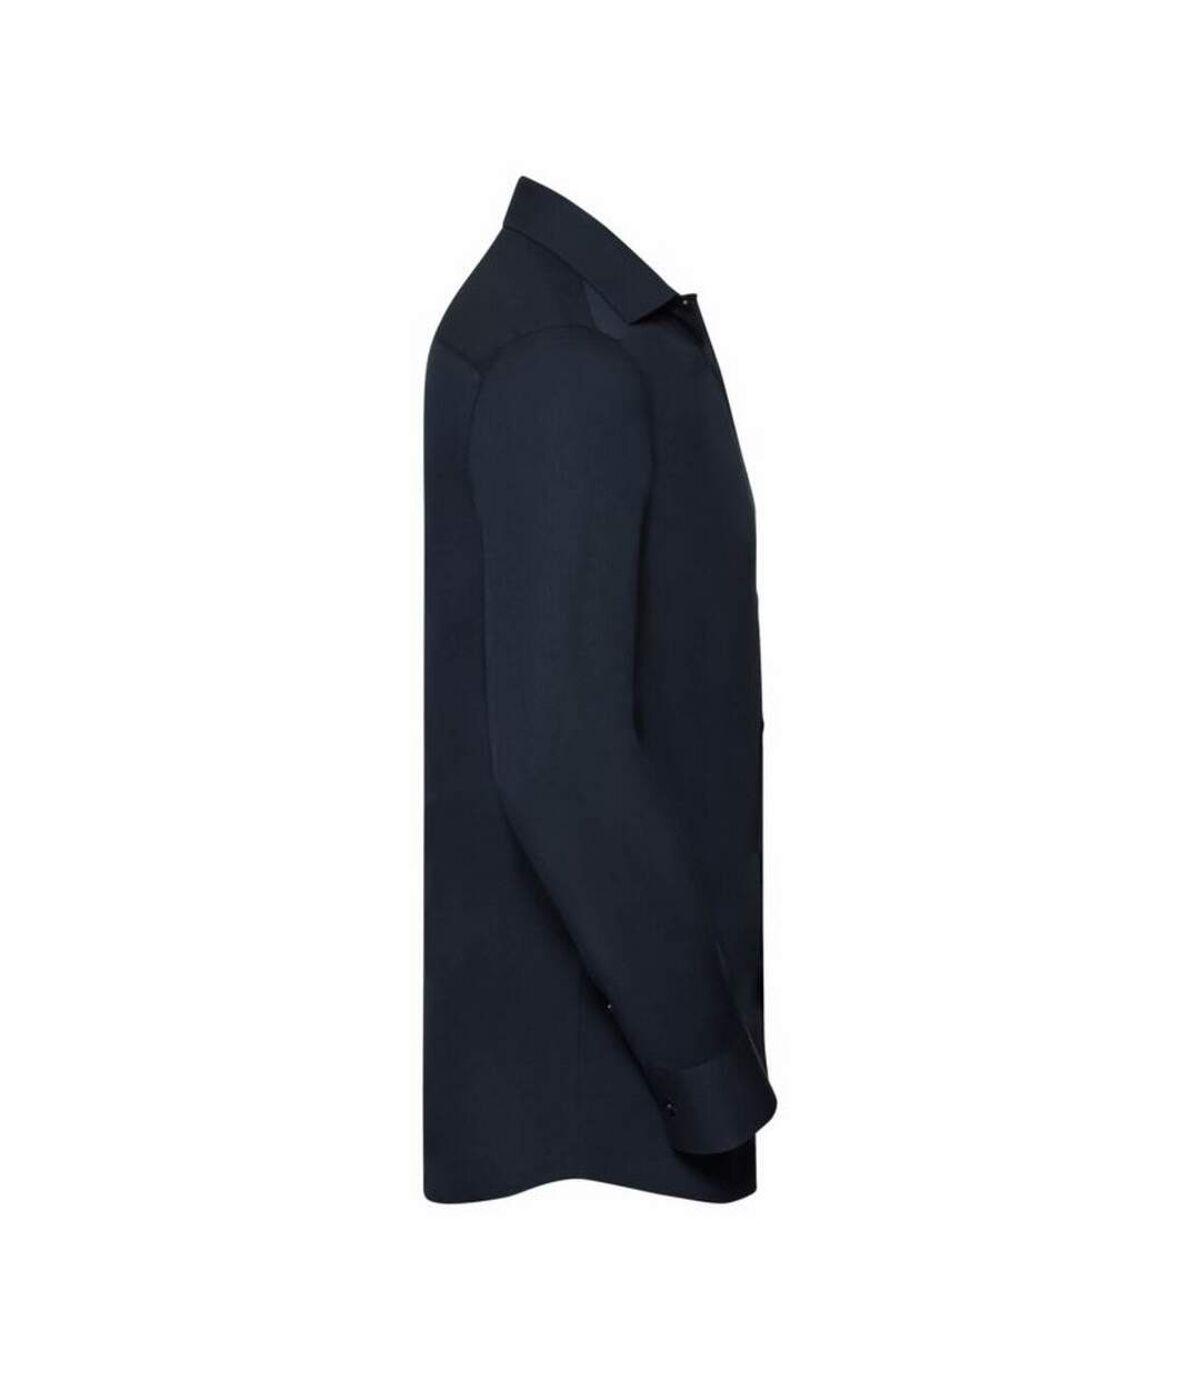 Russell Mens Stretch Moisture Management Work Shirt (Bright Navy) - UTBC2737